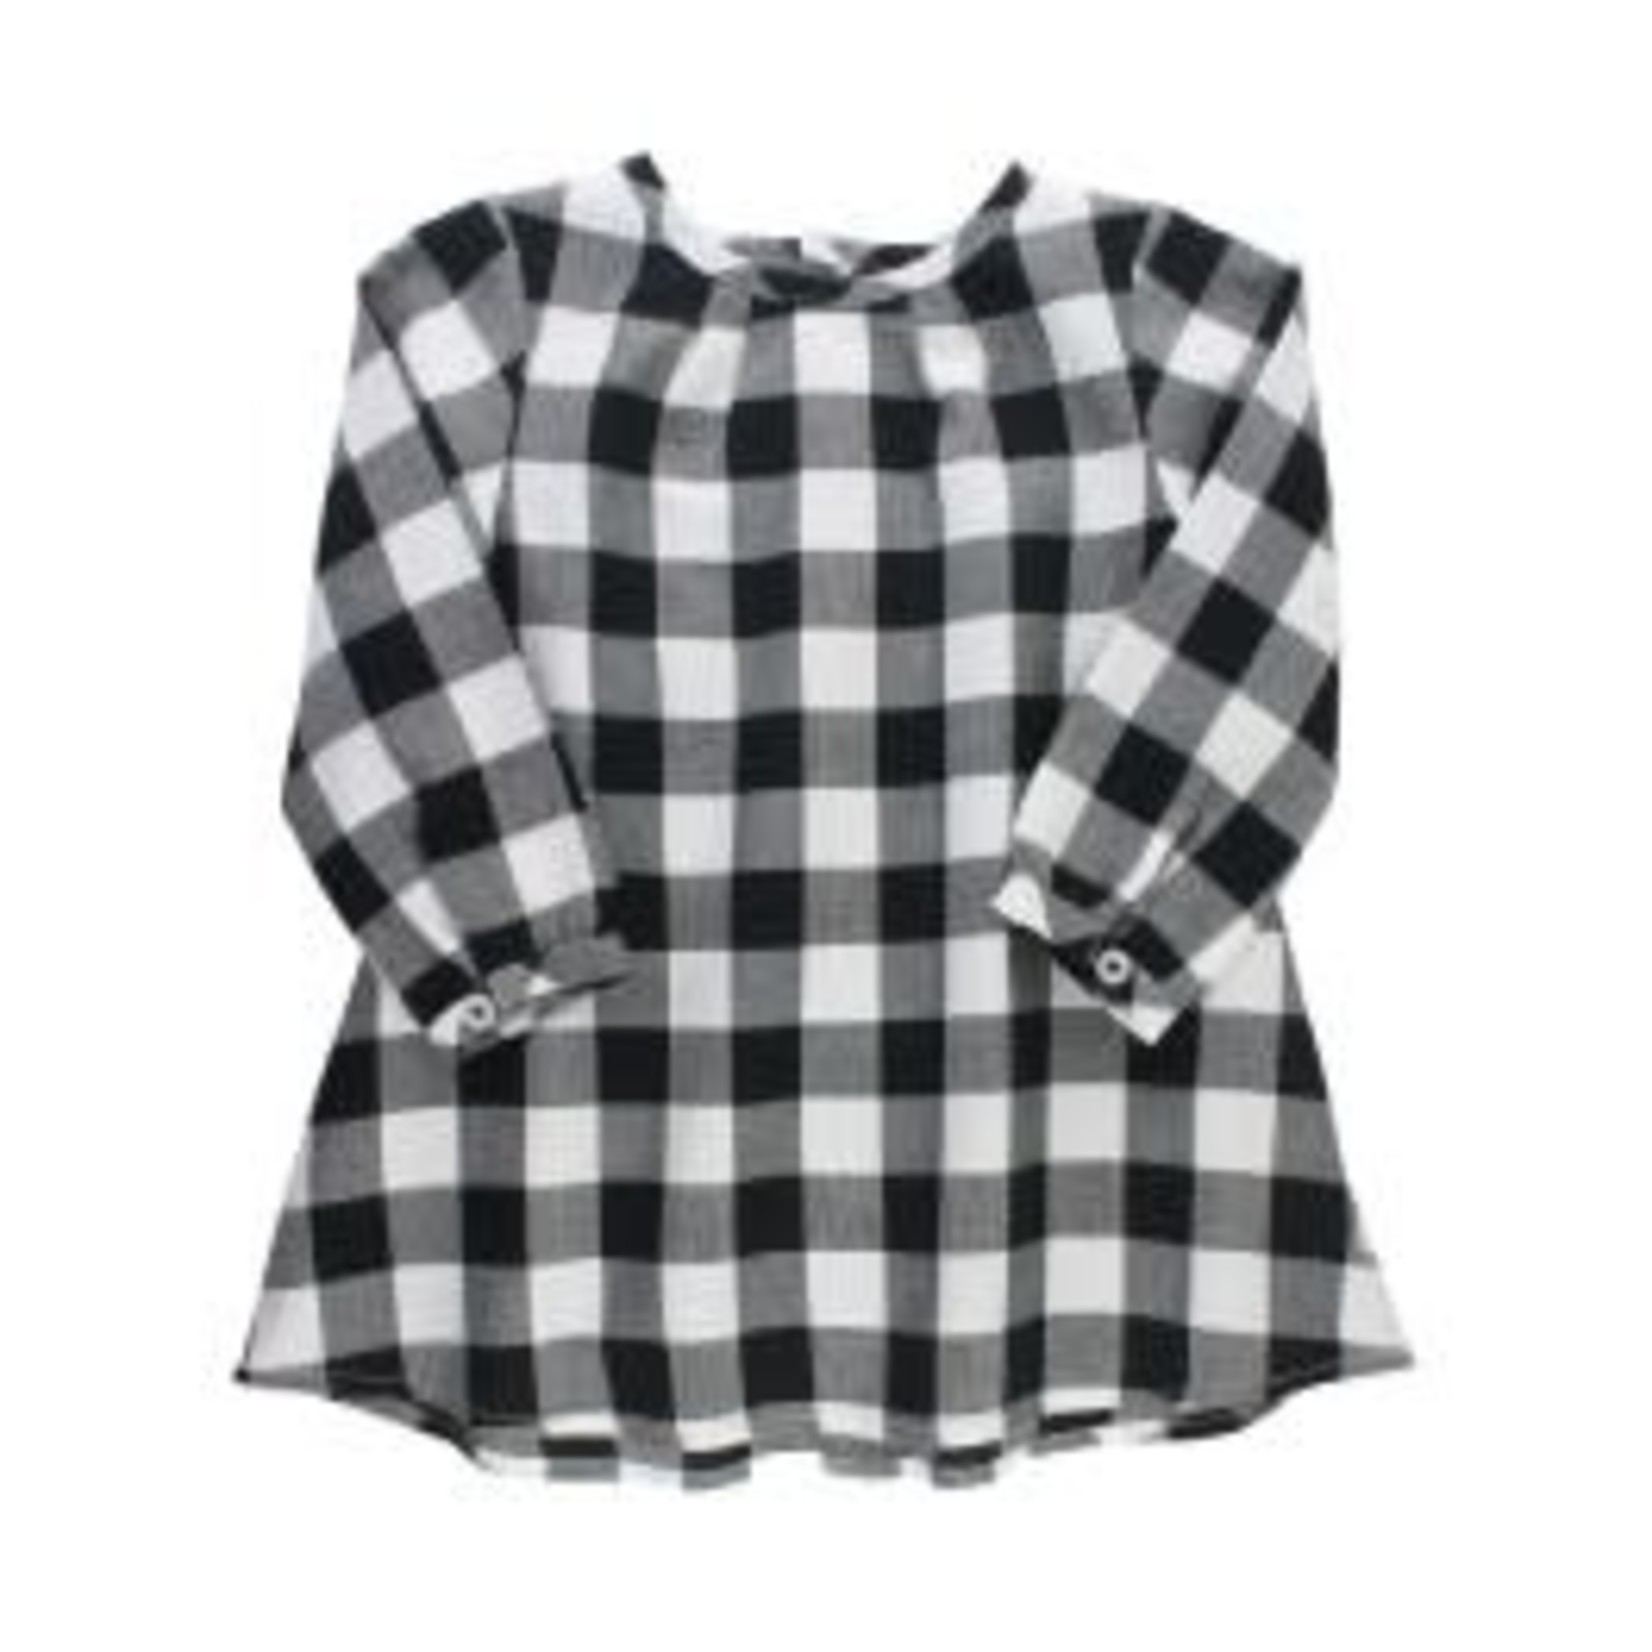 RuffleButts Button Back Dress - Black & White Plaid